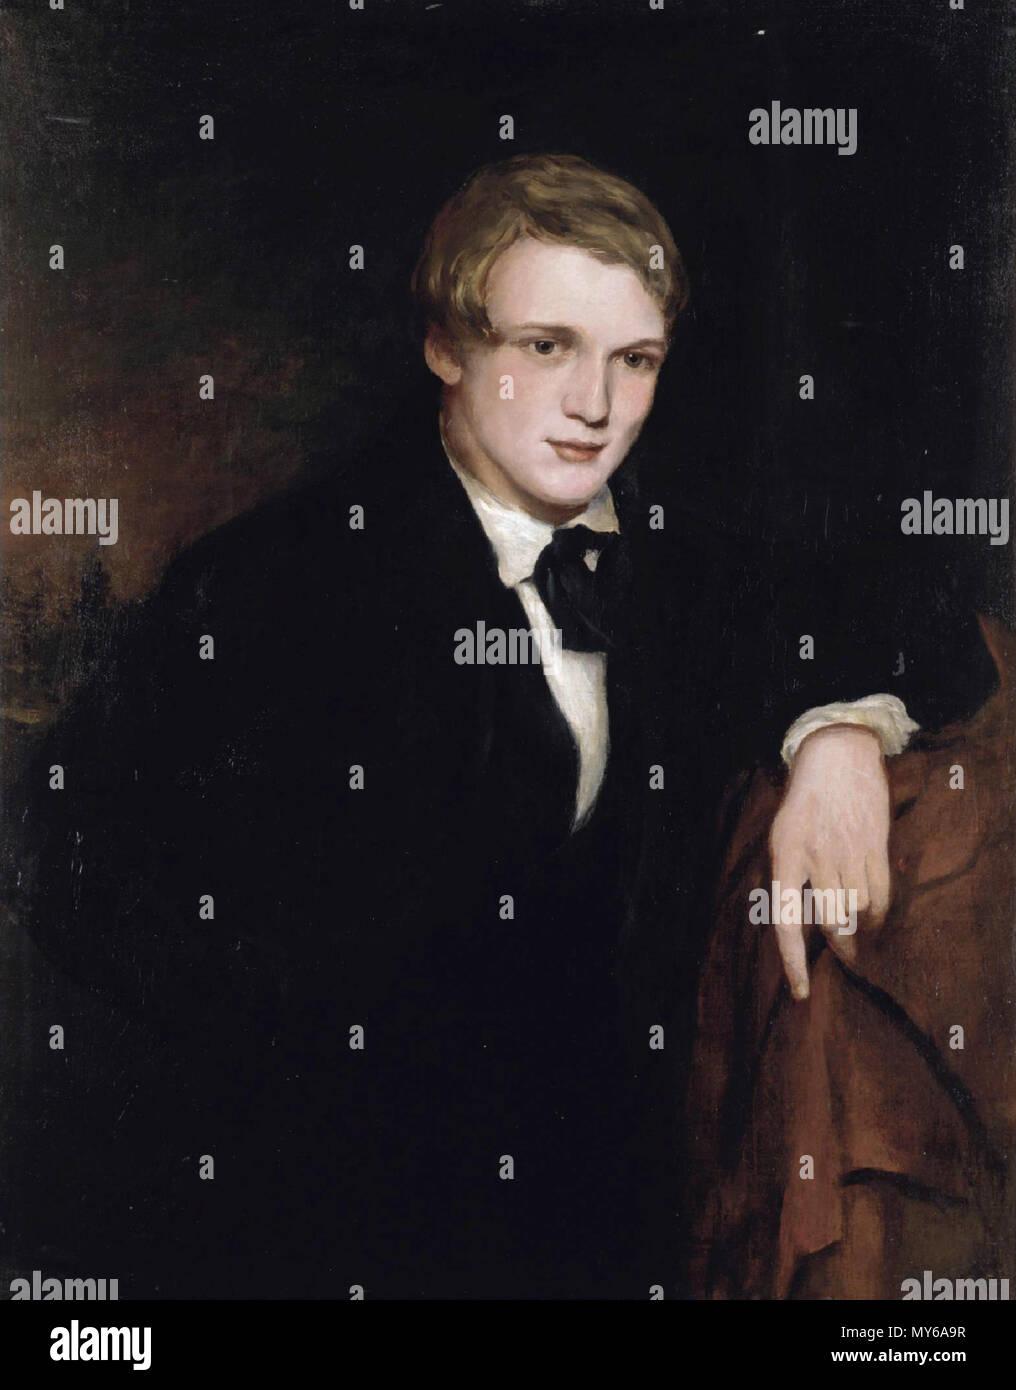 . Inglese: William Powell Frith olio su tela 91,5 x 71 cm 1836-1838 . tra 1836 e 1838. attribuita a Douglas Cowper (1817-1839) 565 William Powell Frith, attribuito a Douglas Cowper (1817-1839) Immagini Stock